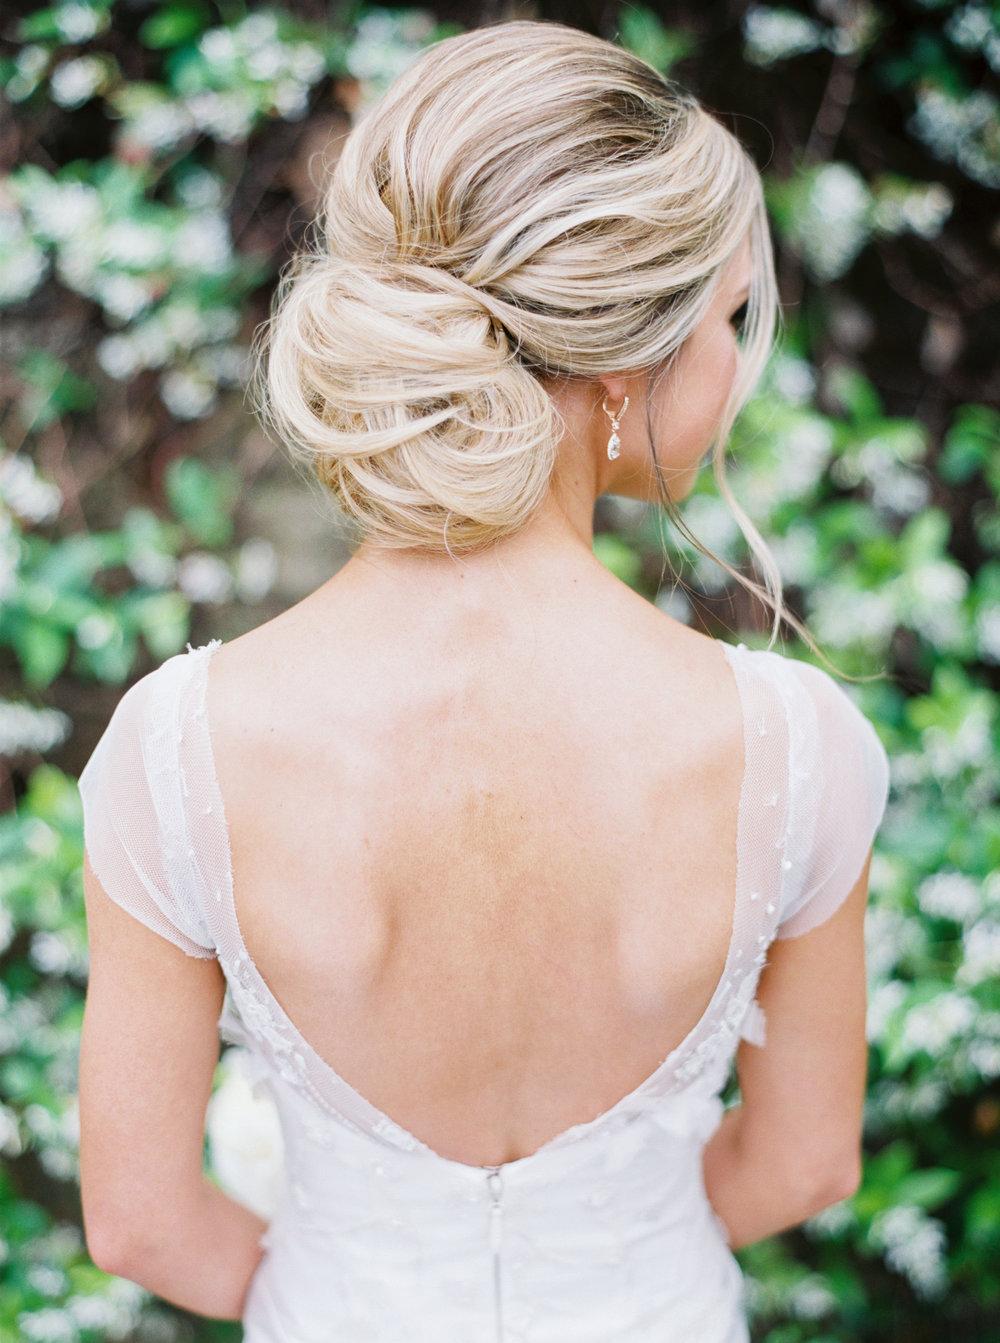 jenna-mcelroy-bridal-portraits-a-southern-tradition-4